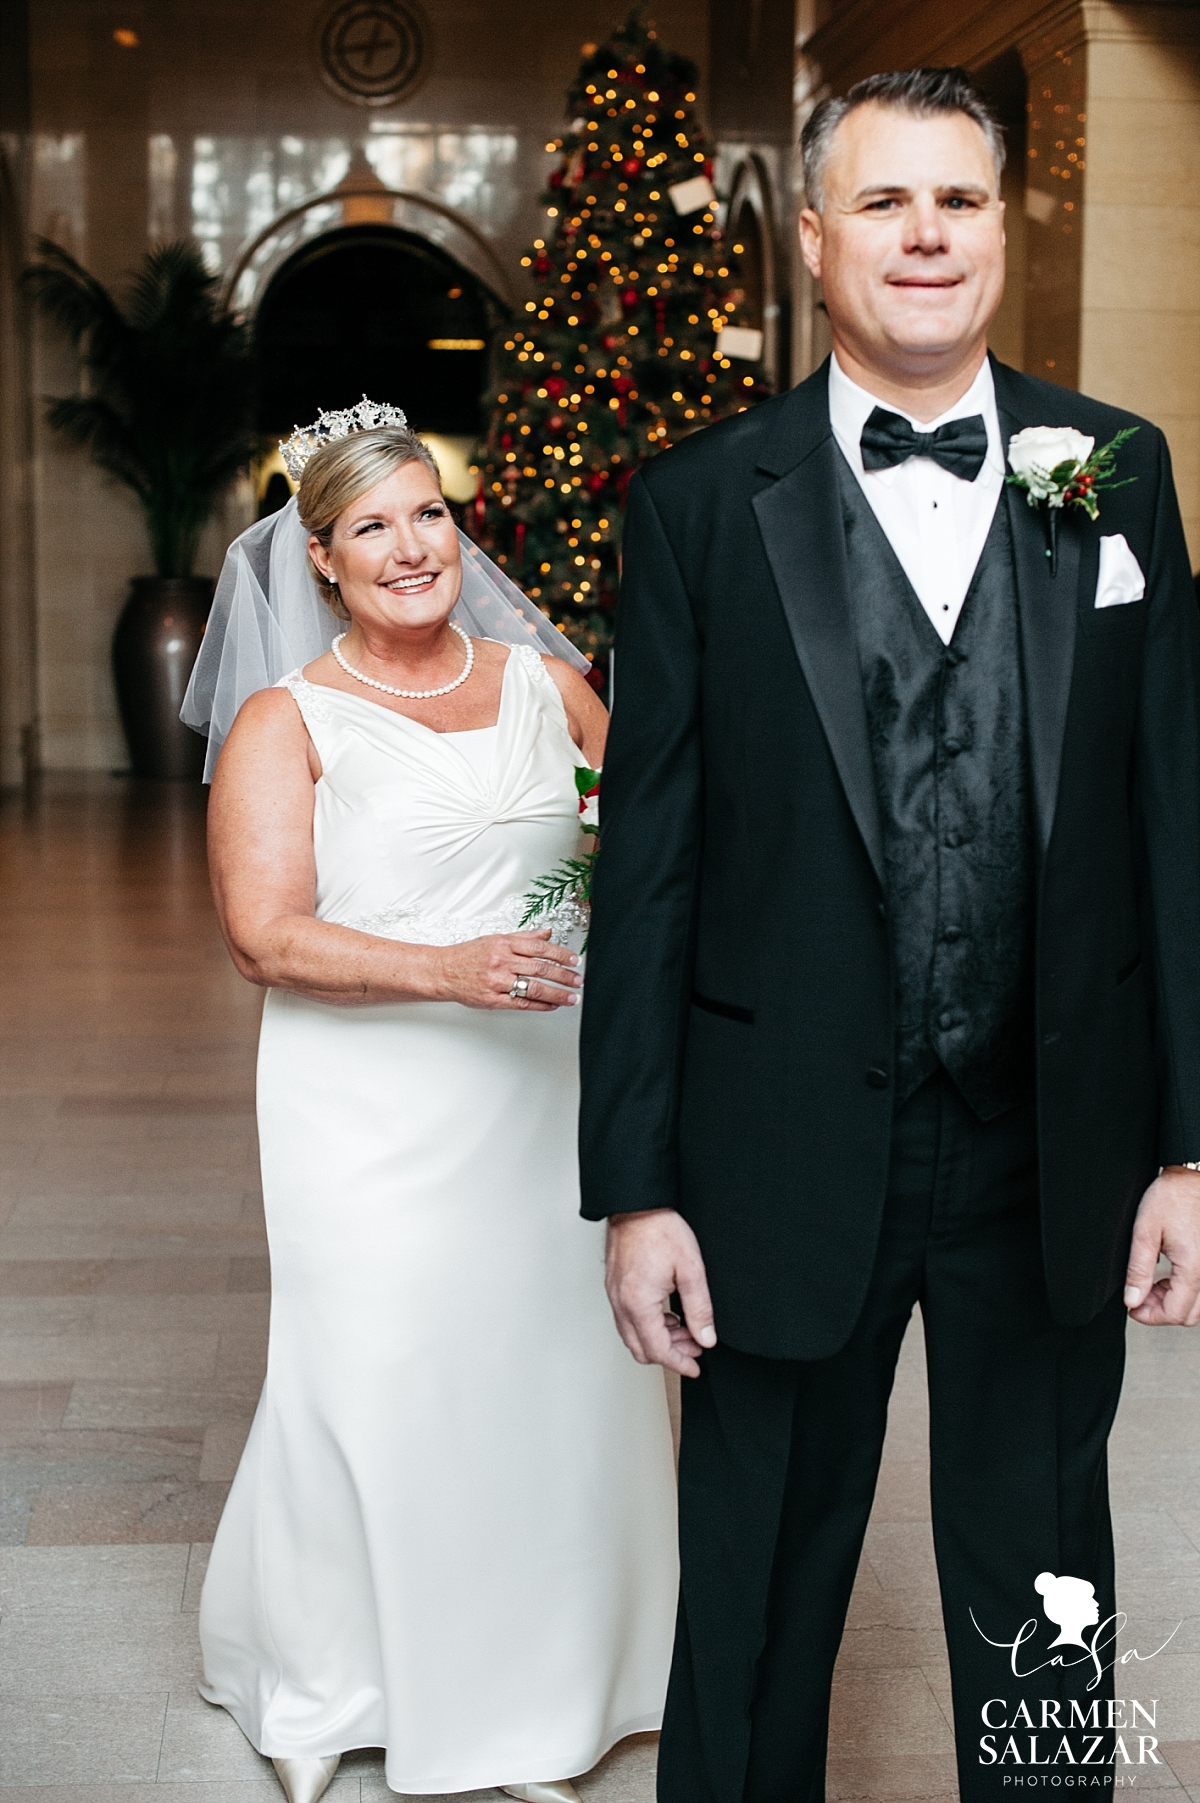 First look at Citizen Hotel wedding - Carmen Salazar